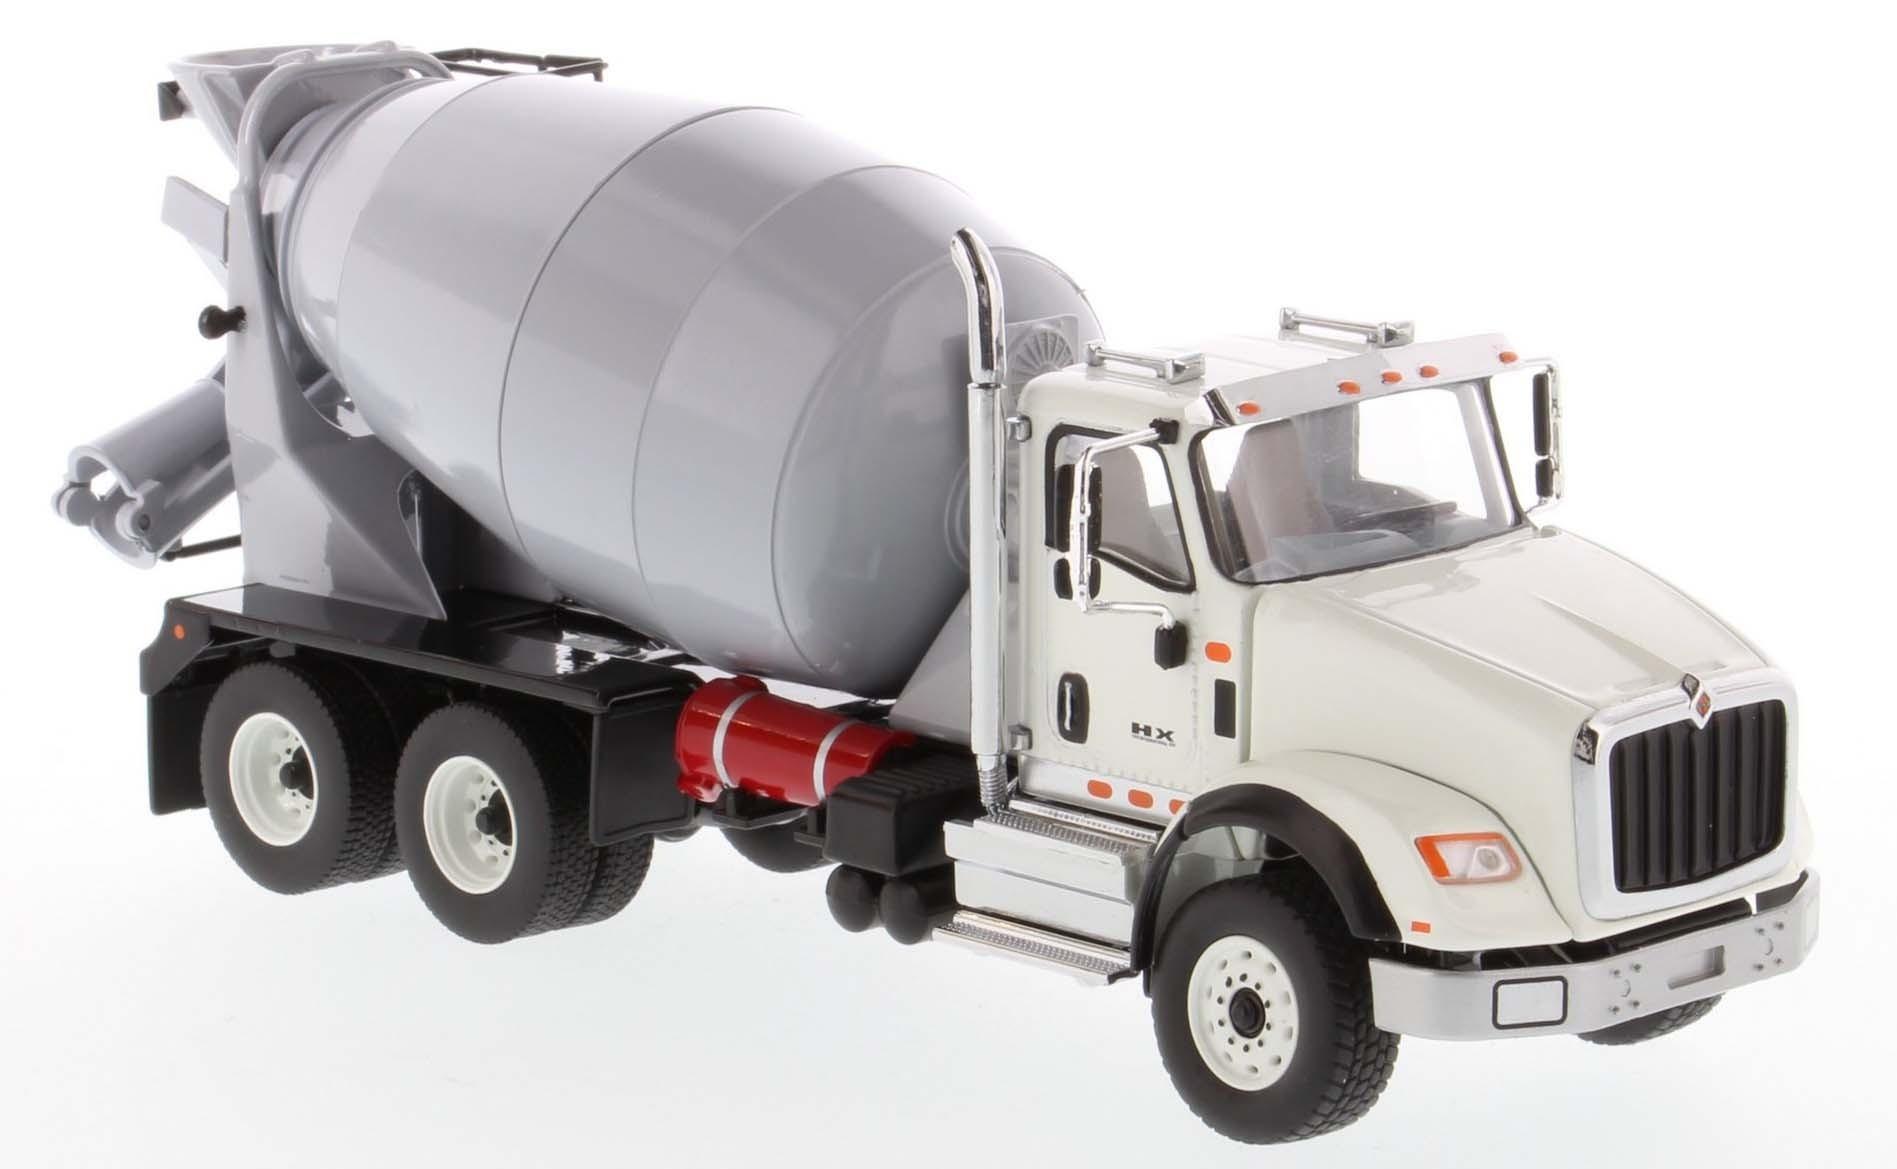 International HX615 Concrete Mixer in White with Light Grey Mixer Drum-PREORDER